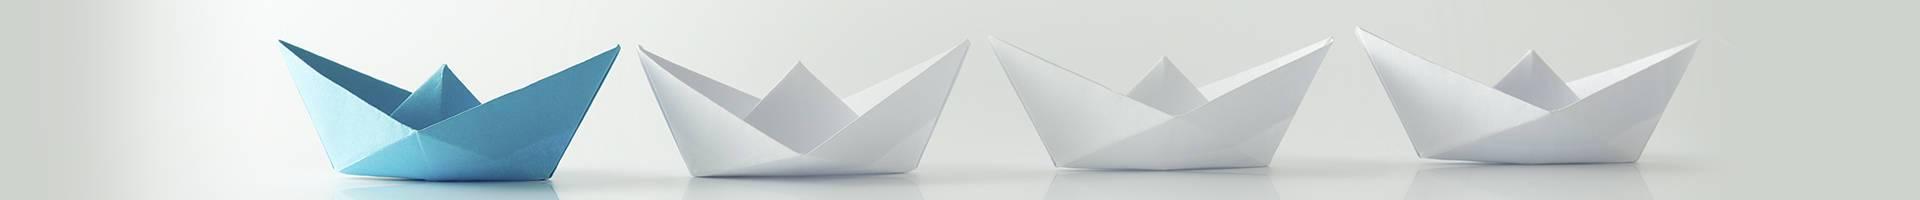 kariera_banner-tytułowy